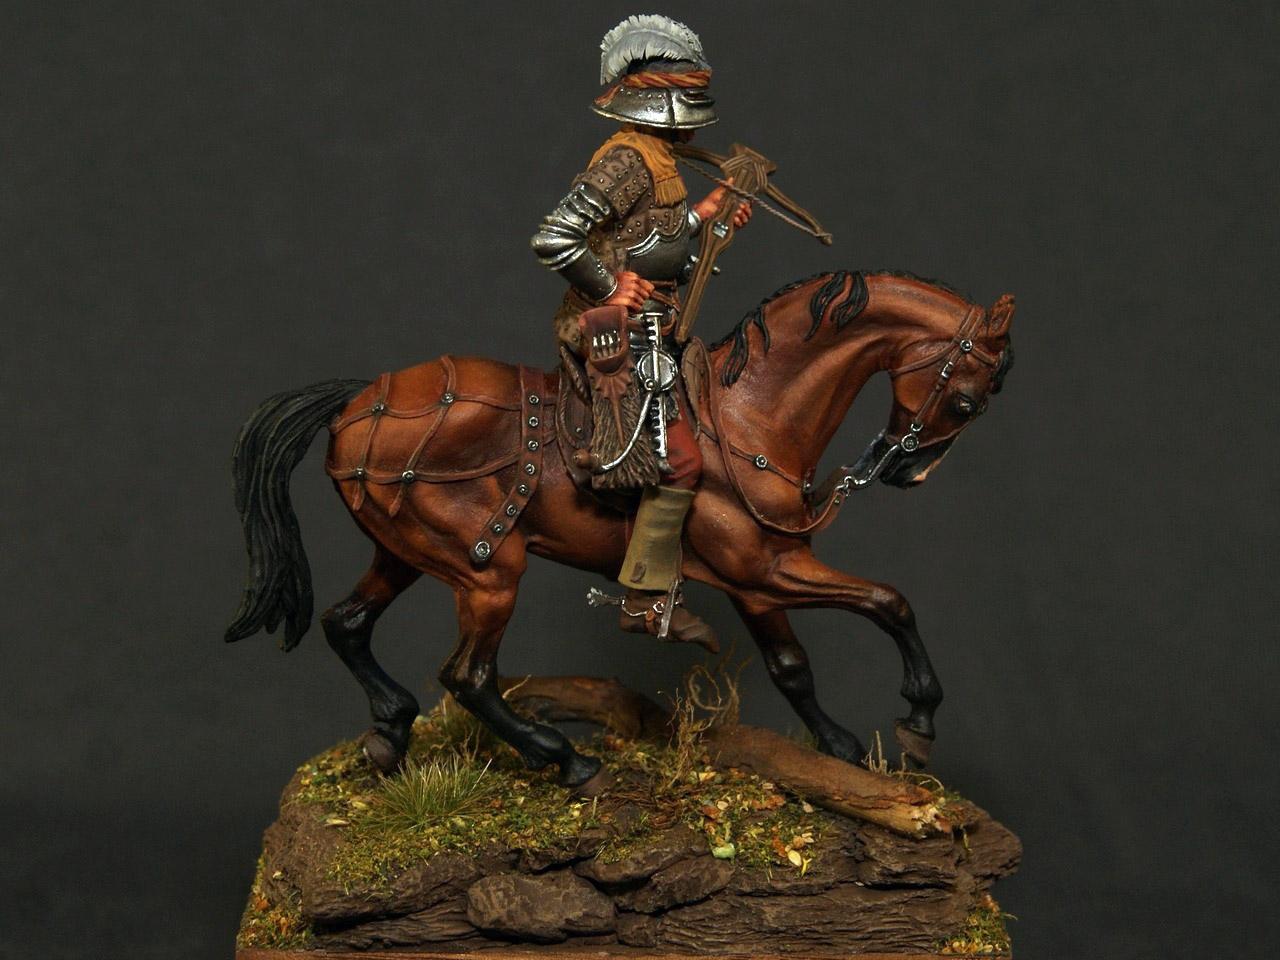 Figures: Swiss crossbowman, XV cent., photo #1